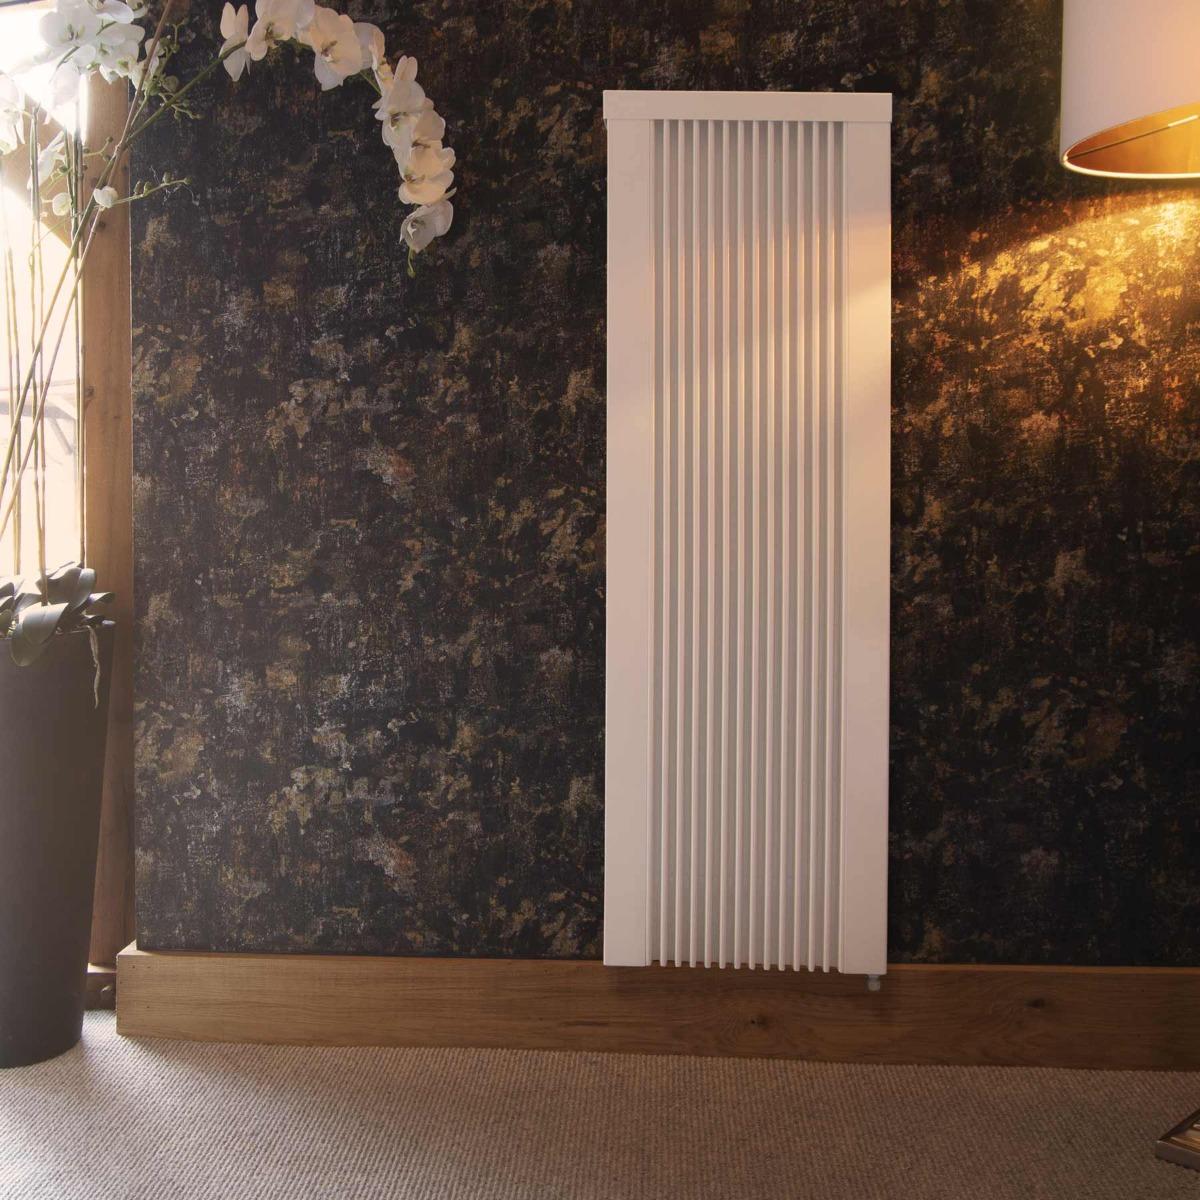 Technotherm KS DSM Smart Heat Retention Radiator - Vertical